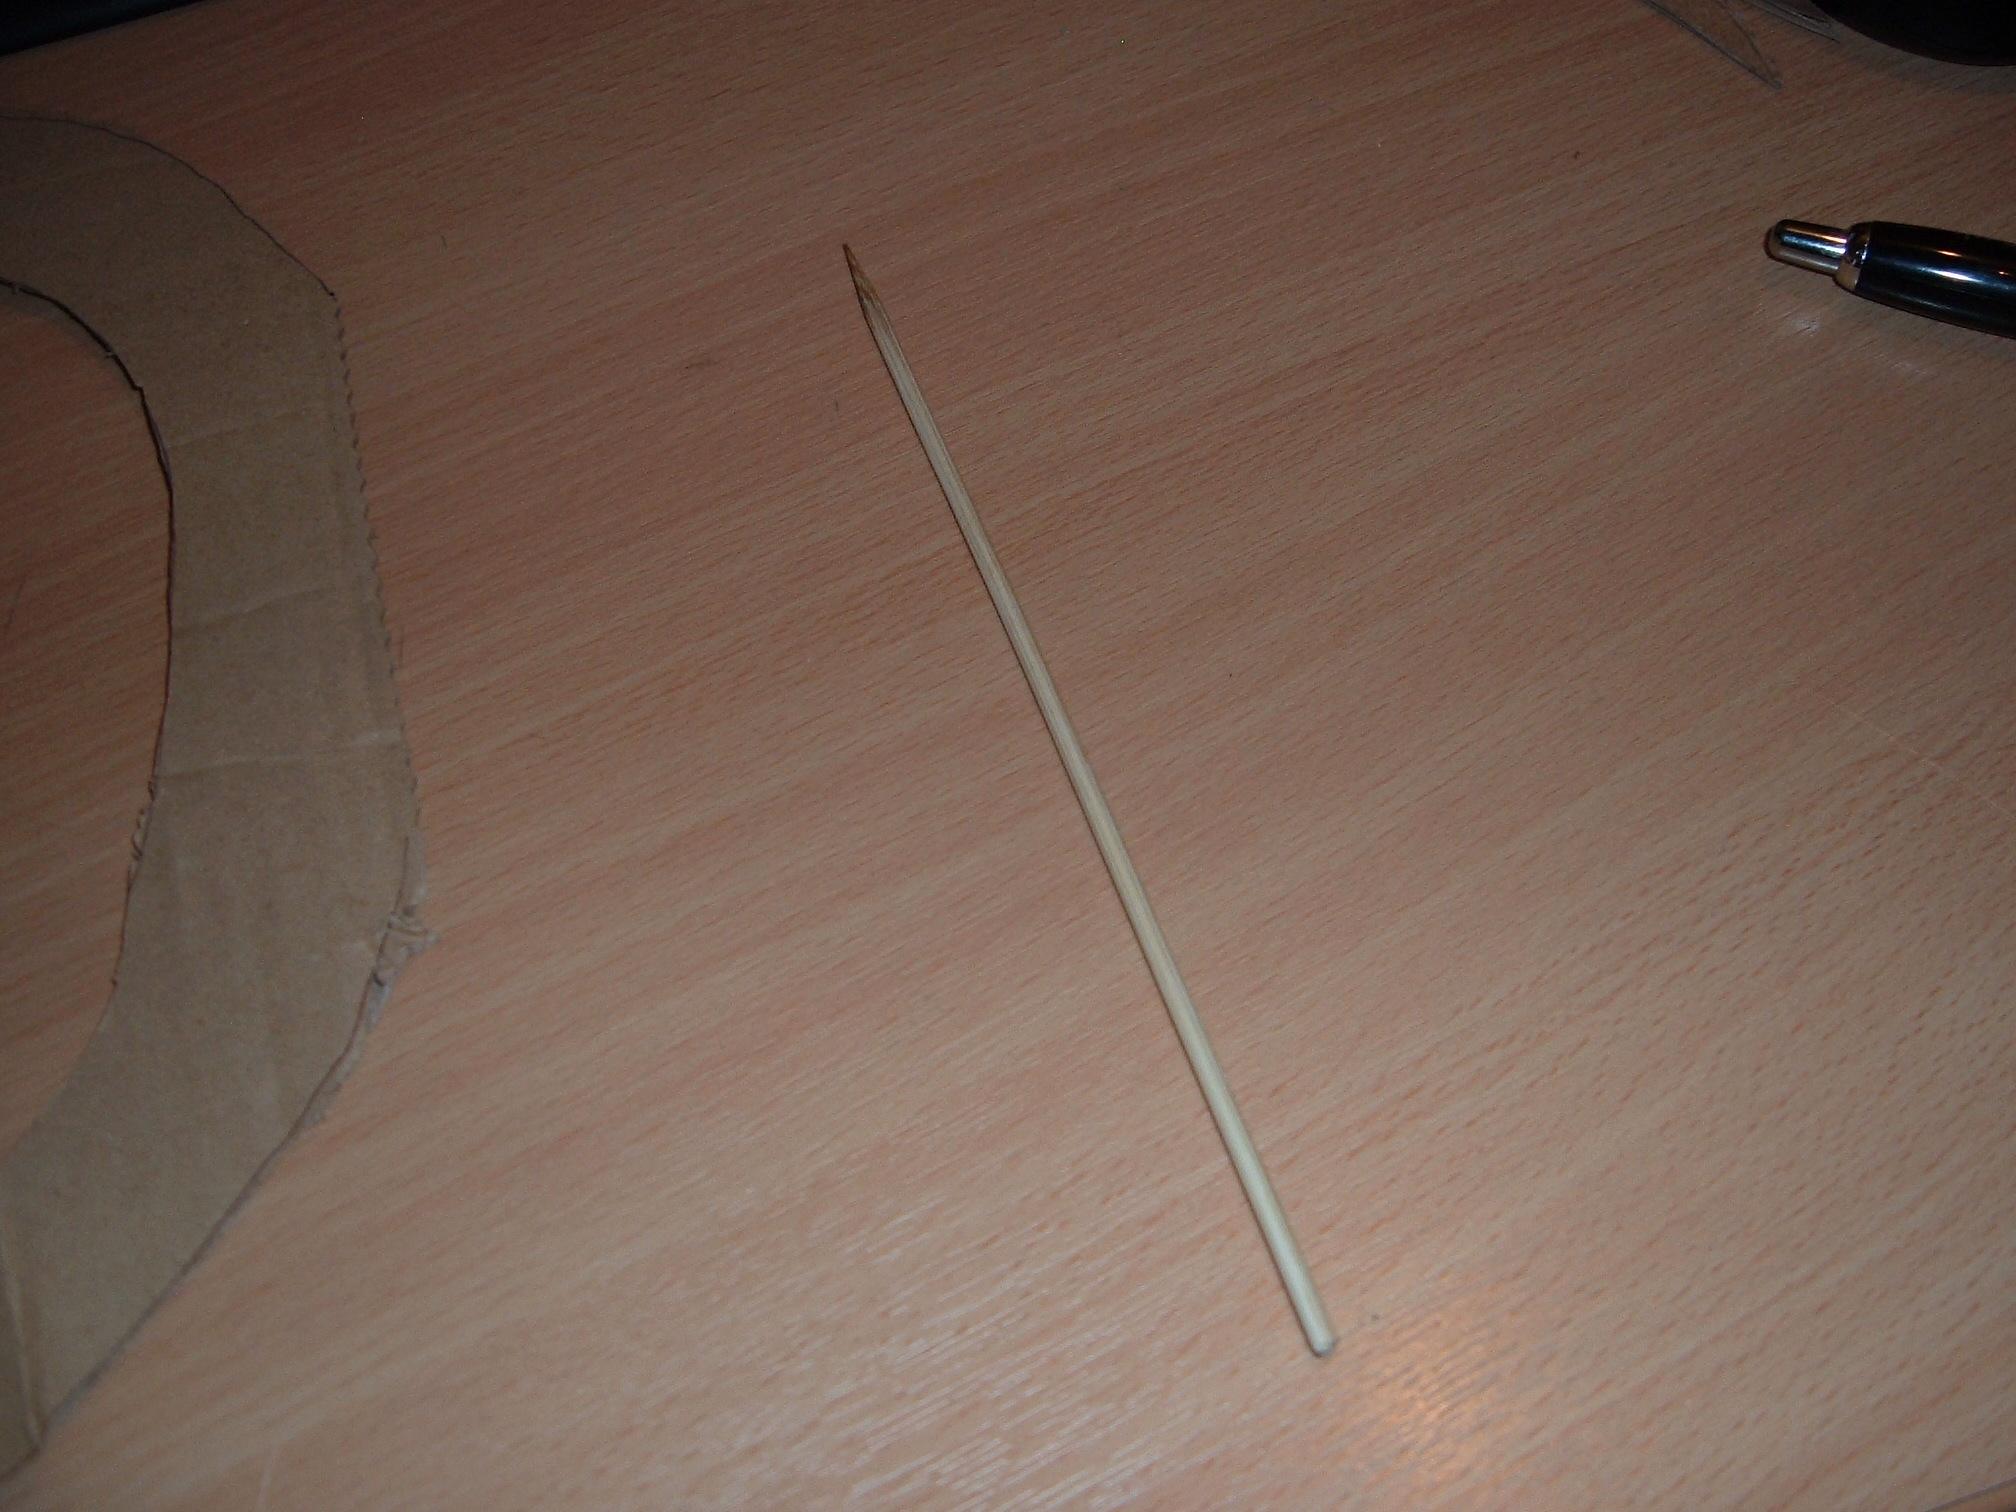 Picture of Equipment/Materials